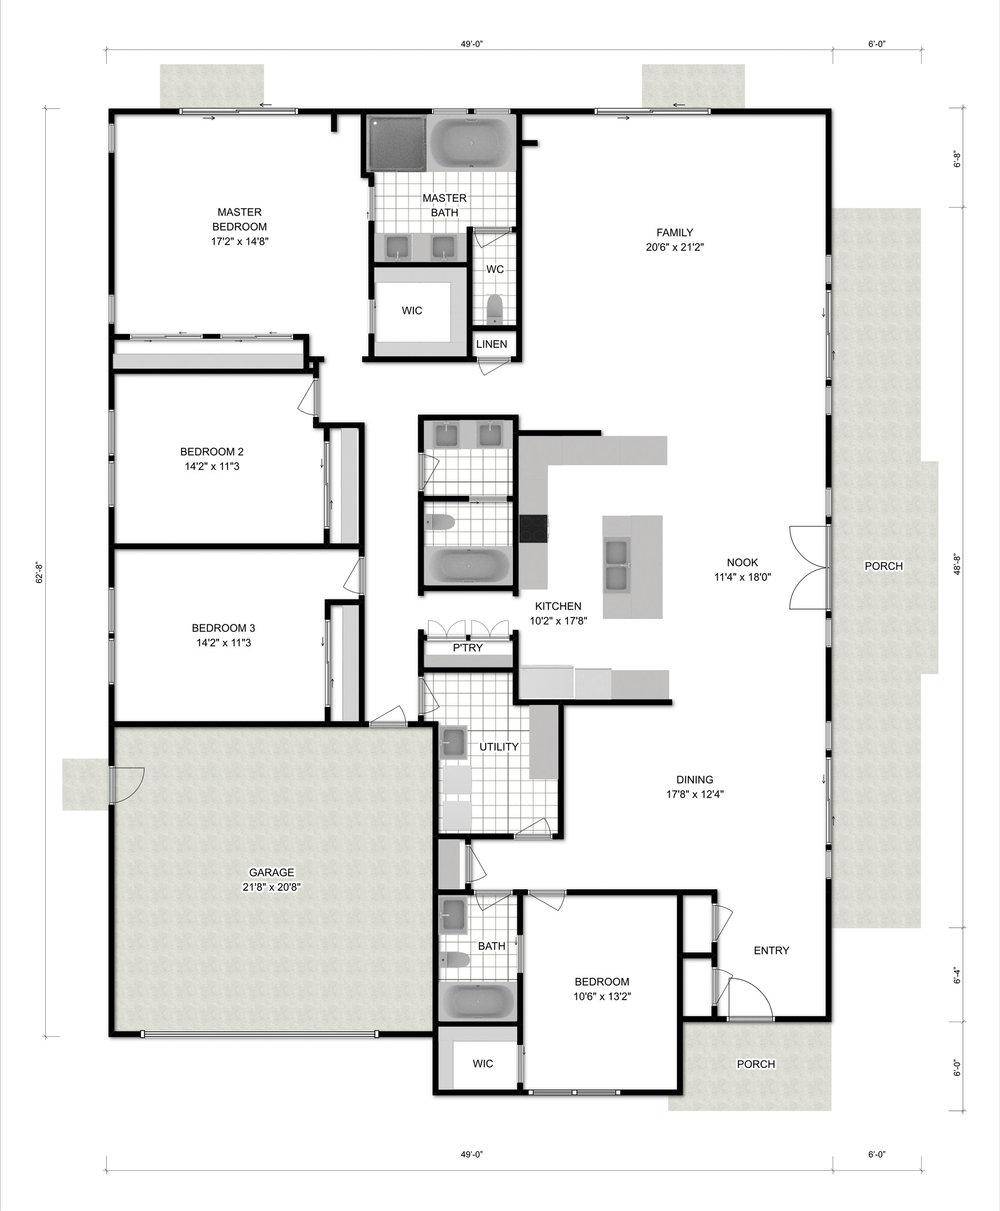 1028_Floorplan (print).jpg